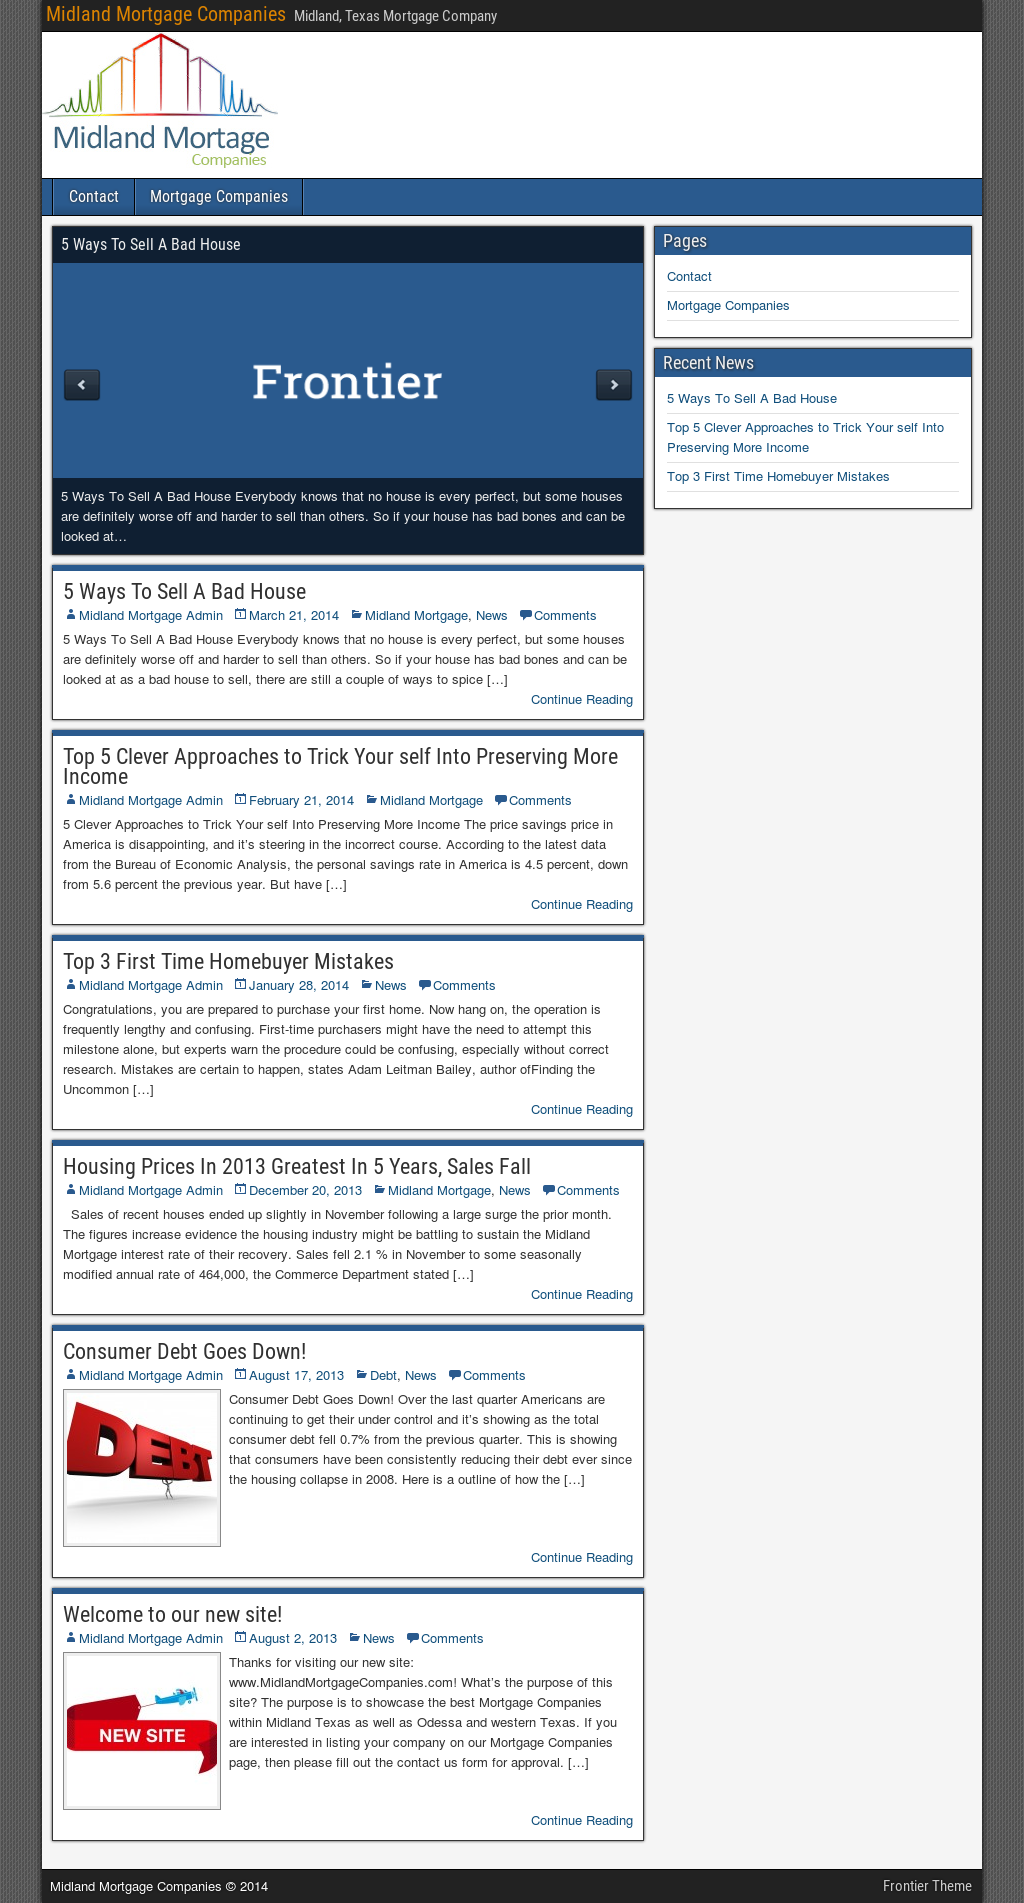 Midland Mortgage Companies Competitors, Revenue and